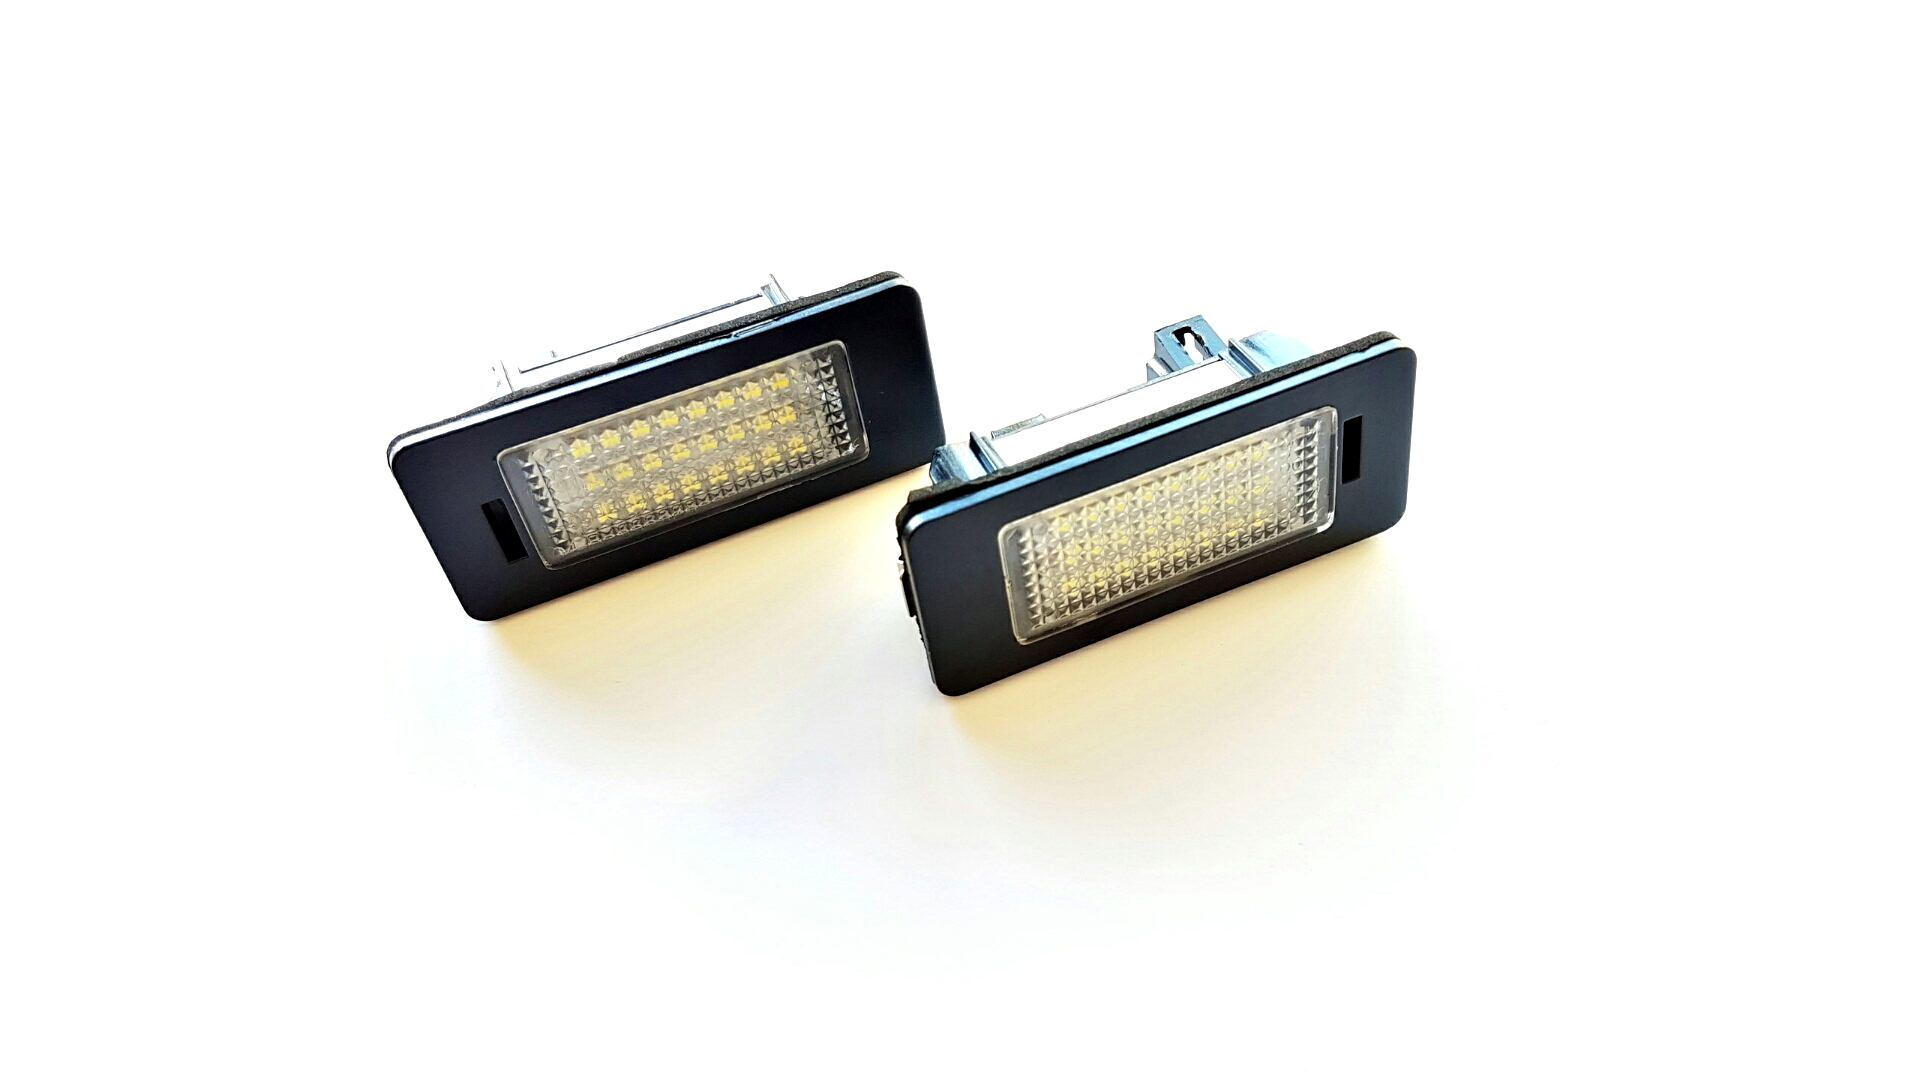 PLAFONES MATRICULA LED AUDI A1 A4 A5 A6 A7 Q5 TT RS5 LEDIAMOND LMD030802